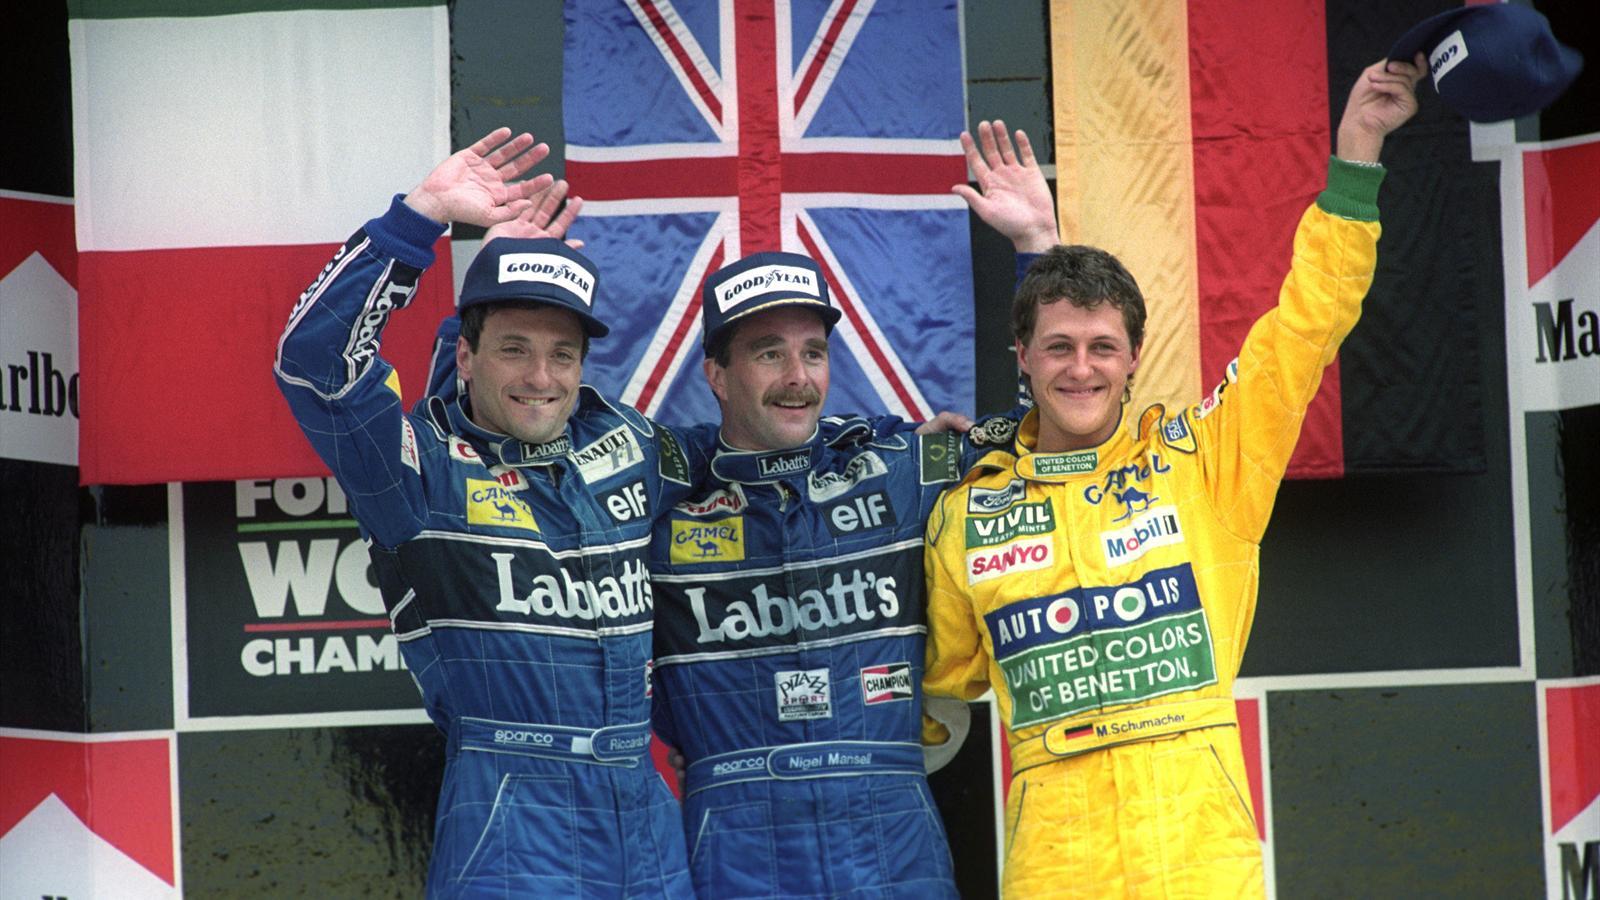 Michael Schumacher's first Formula 1 podium, at the 1992 Mexican Grand Prix